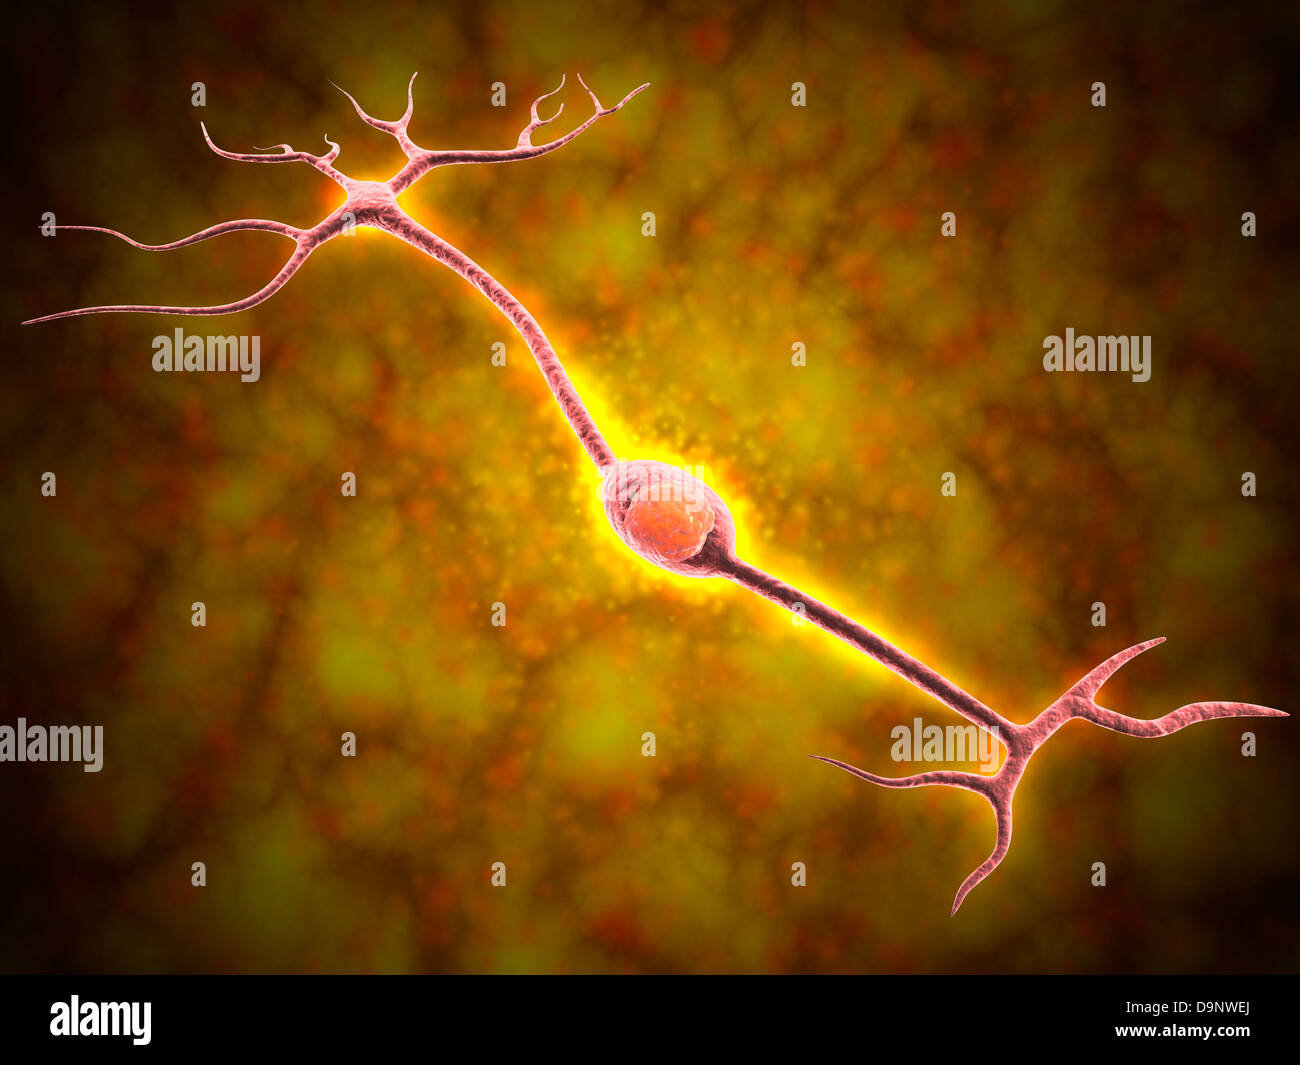 Vista microscópica de una neurona bipolar Imagen De Stock